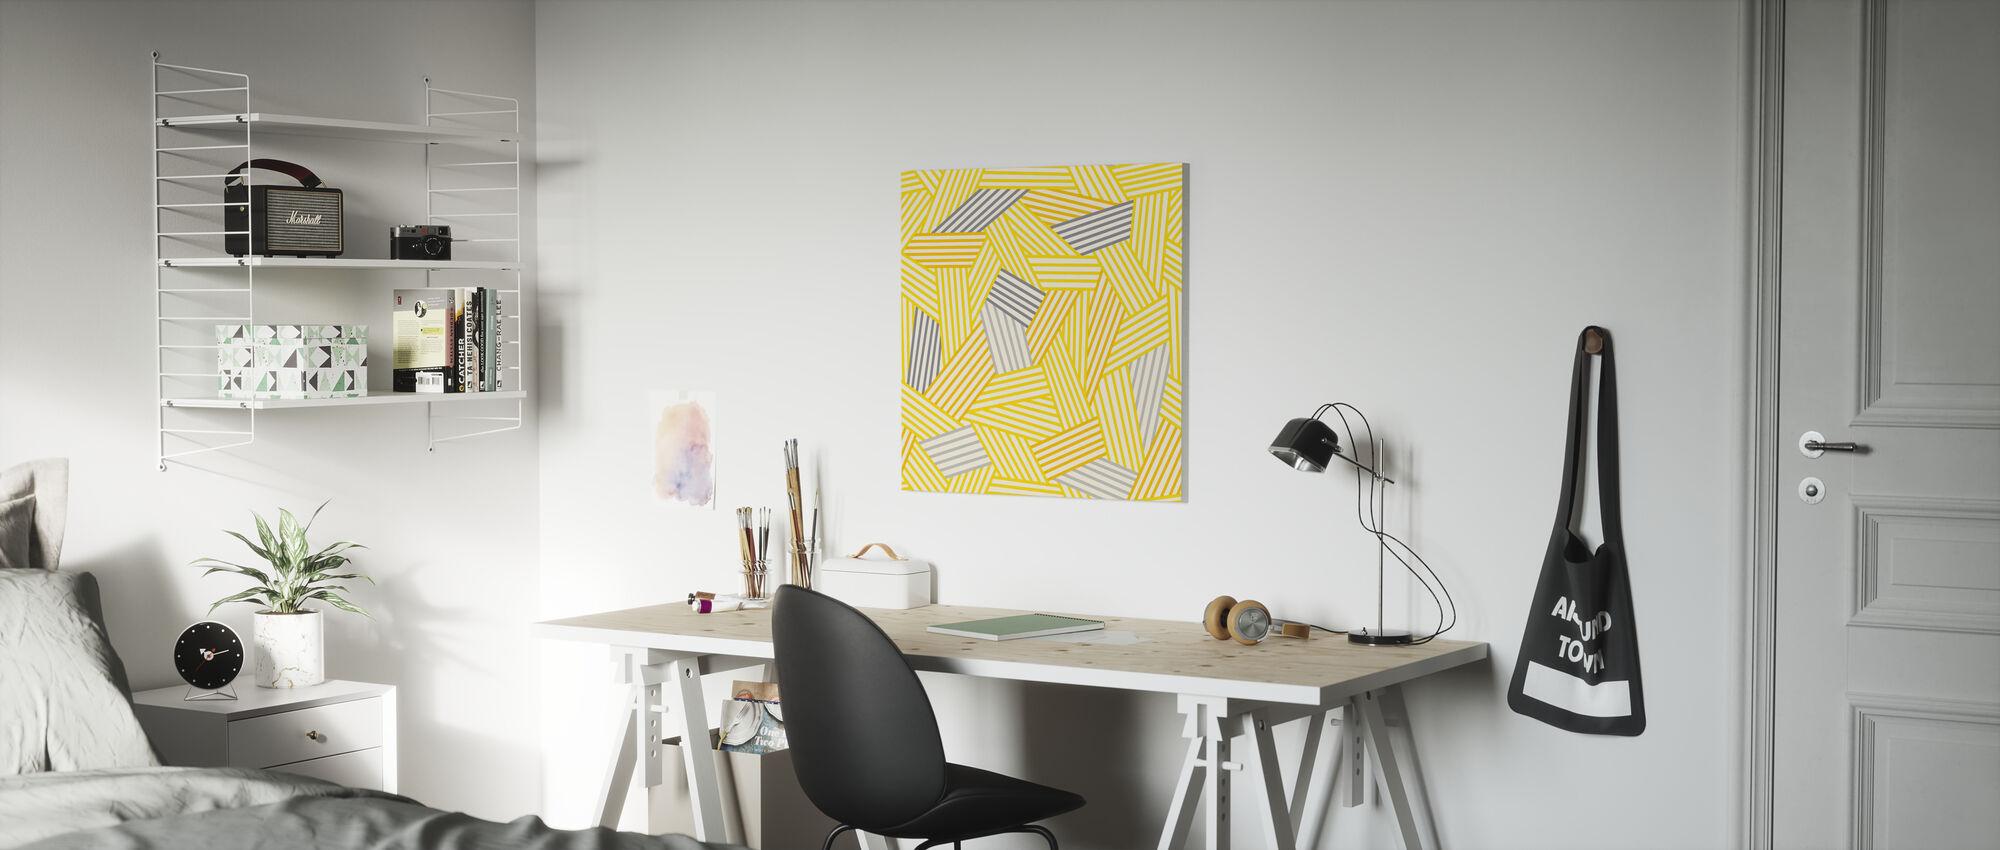 Going Geometric 3 - Canvas print - Kids Room